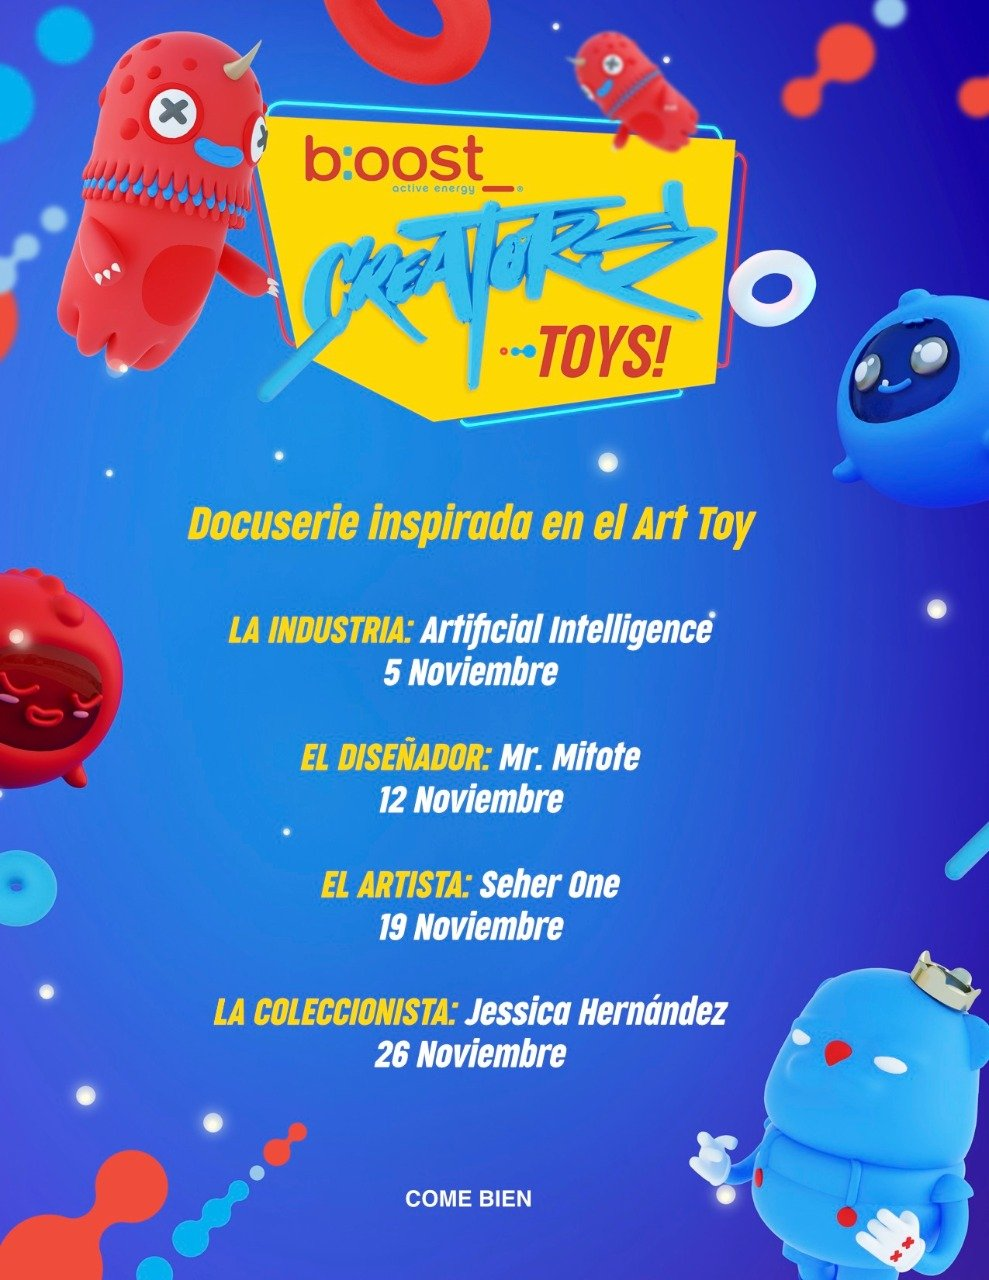 docuserie inspirada en los art toys